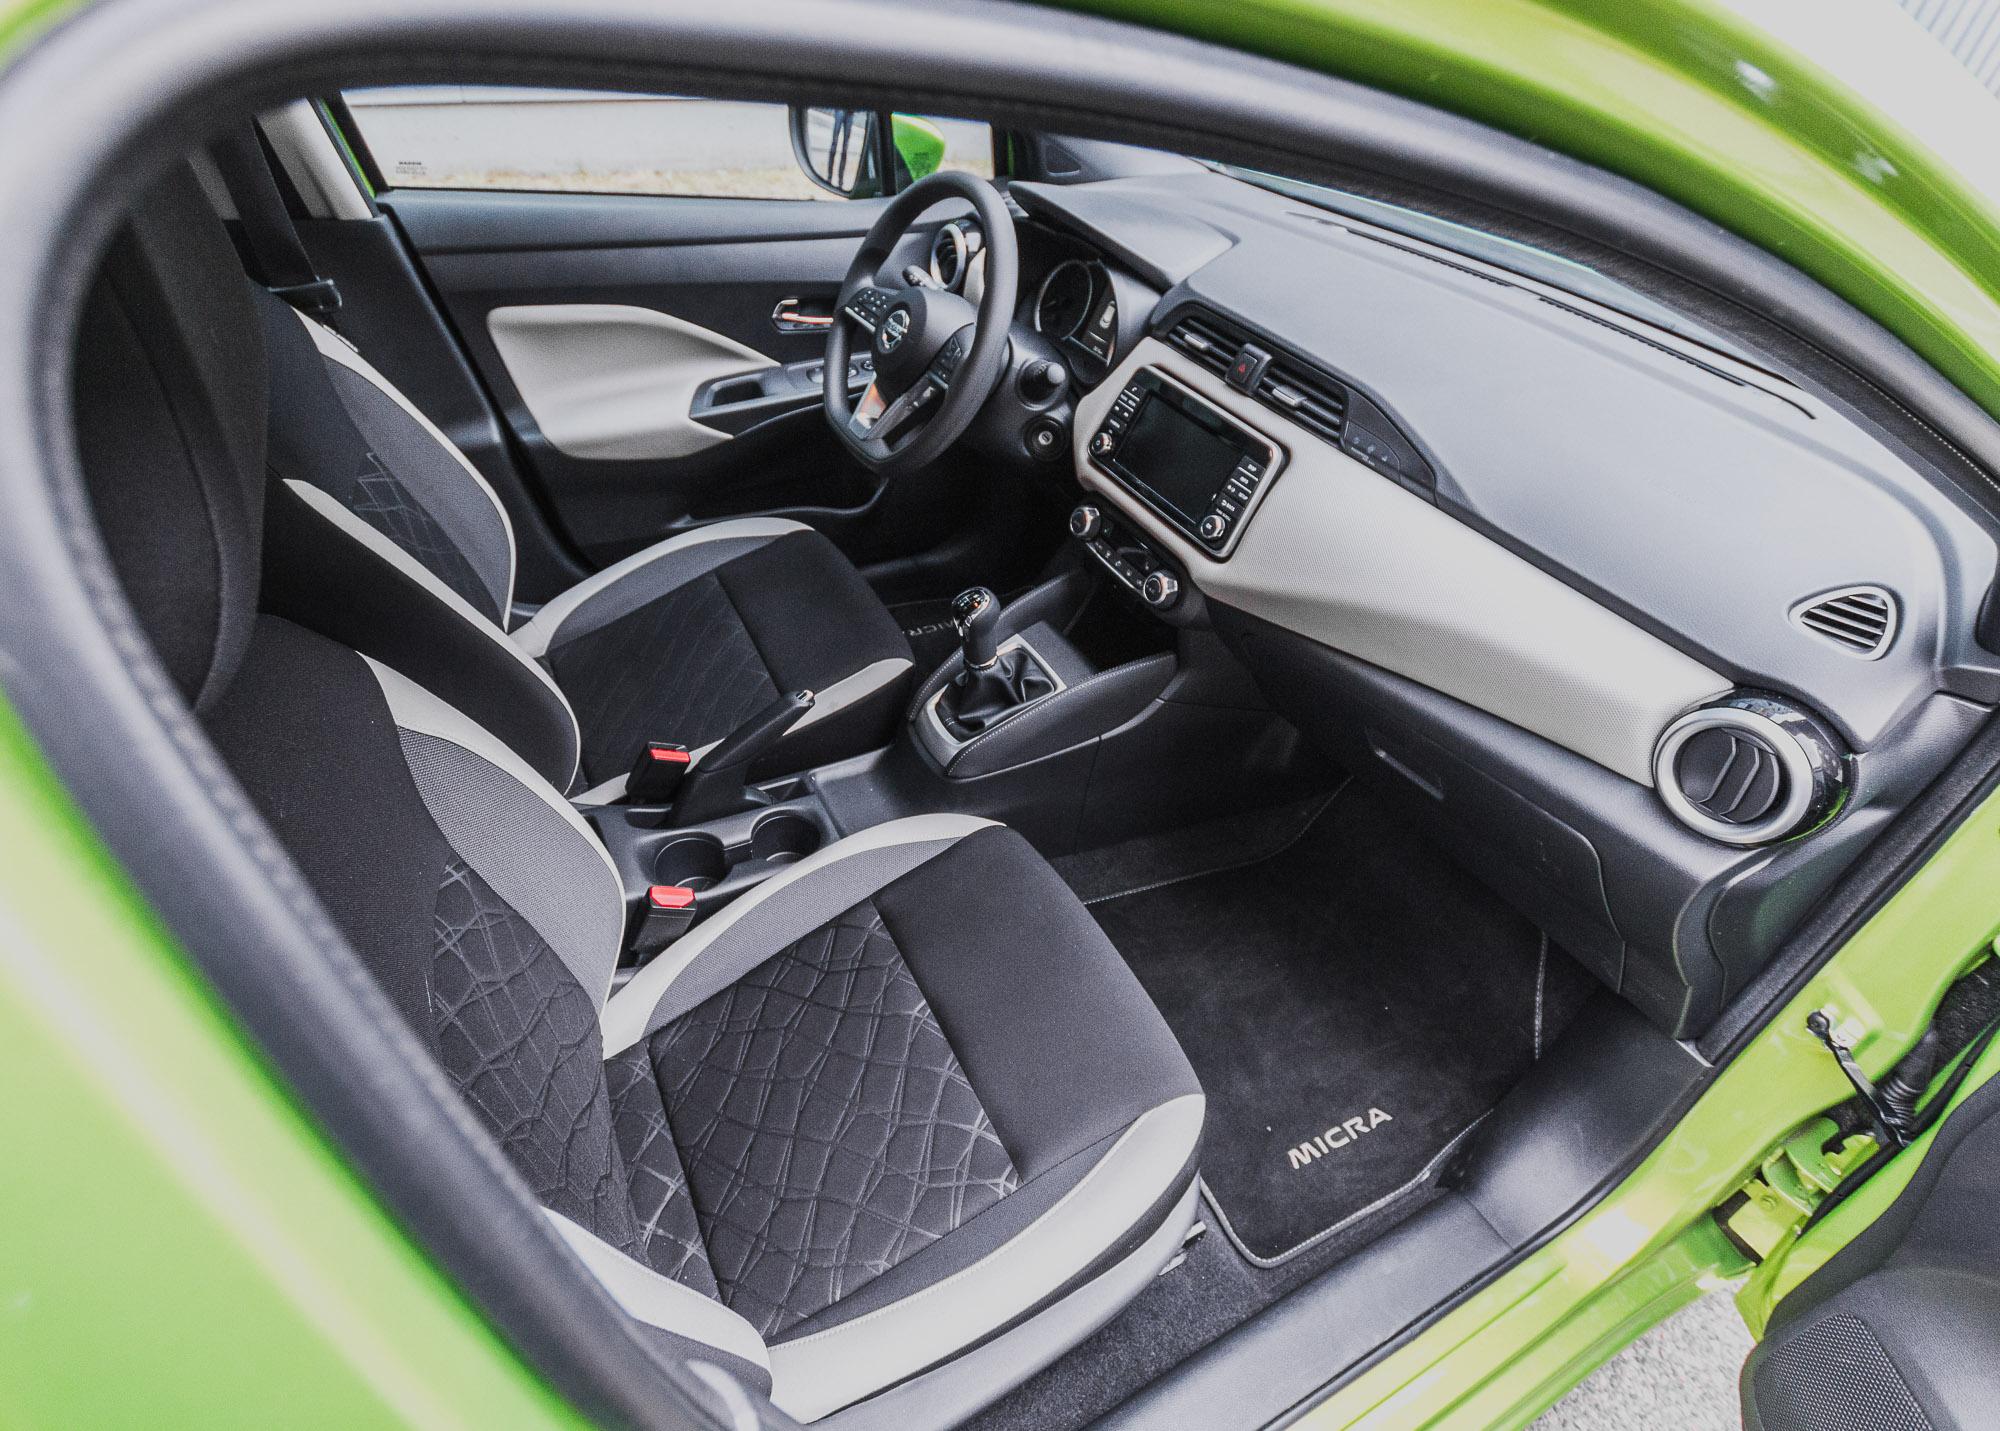 Nissan Micra 1.0 test